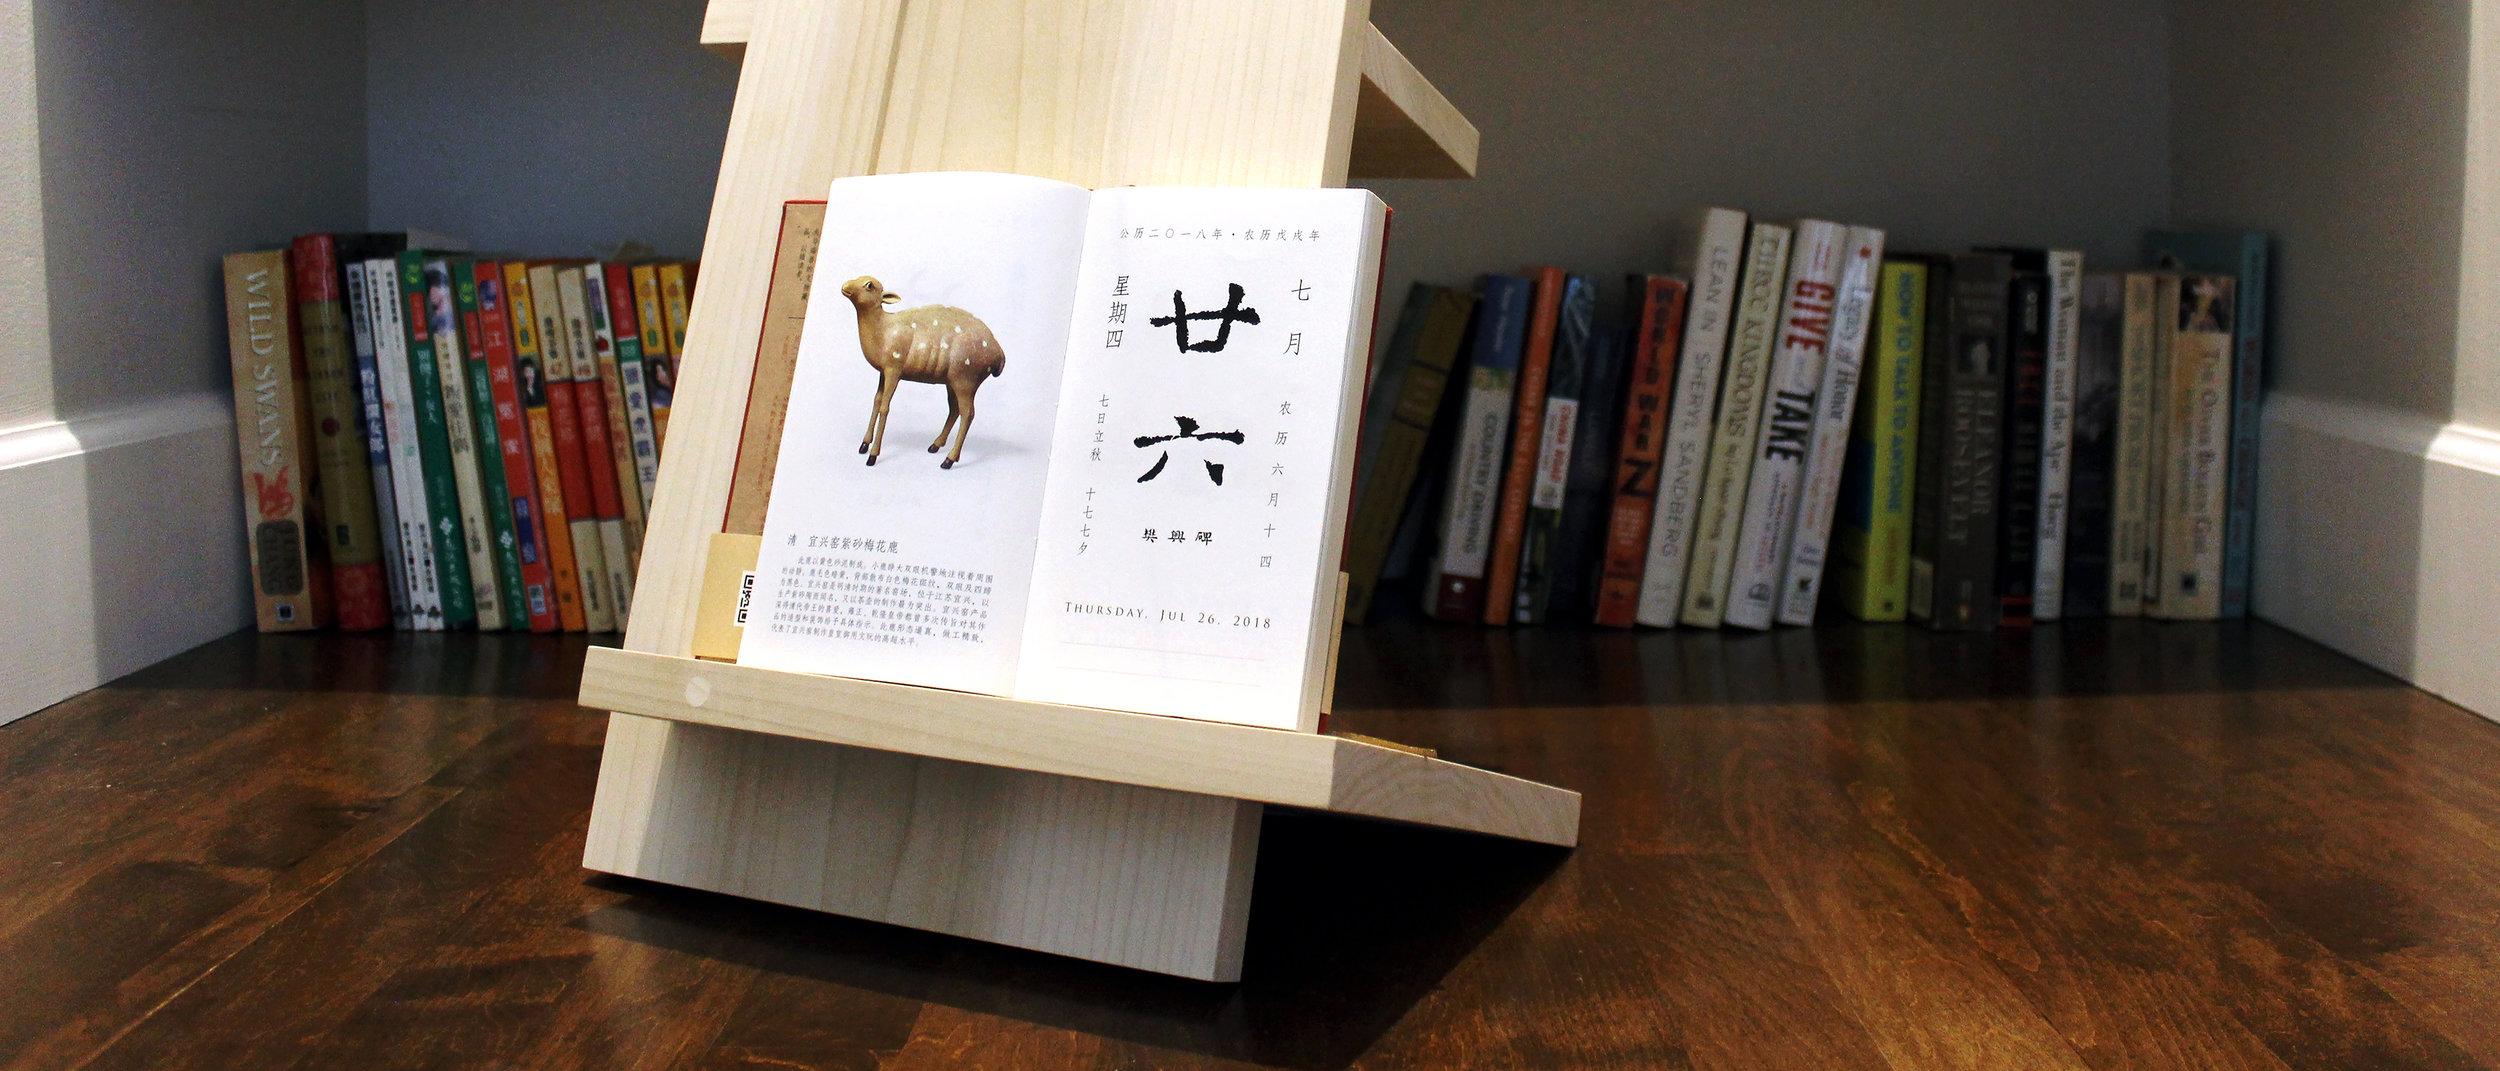 booktable_cover.jpg